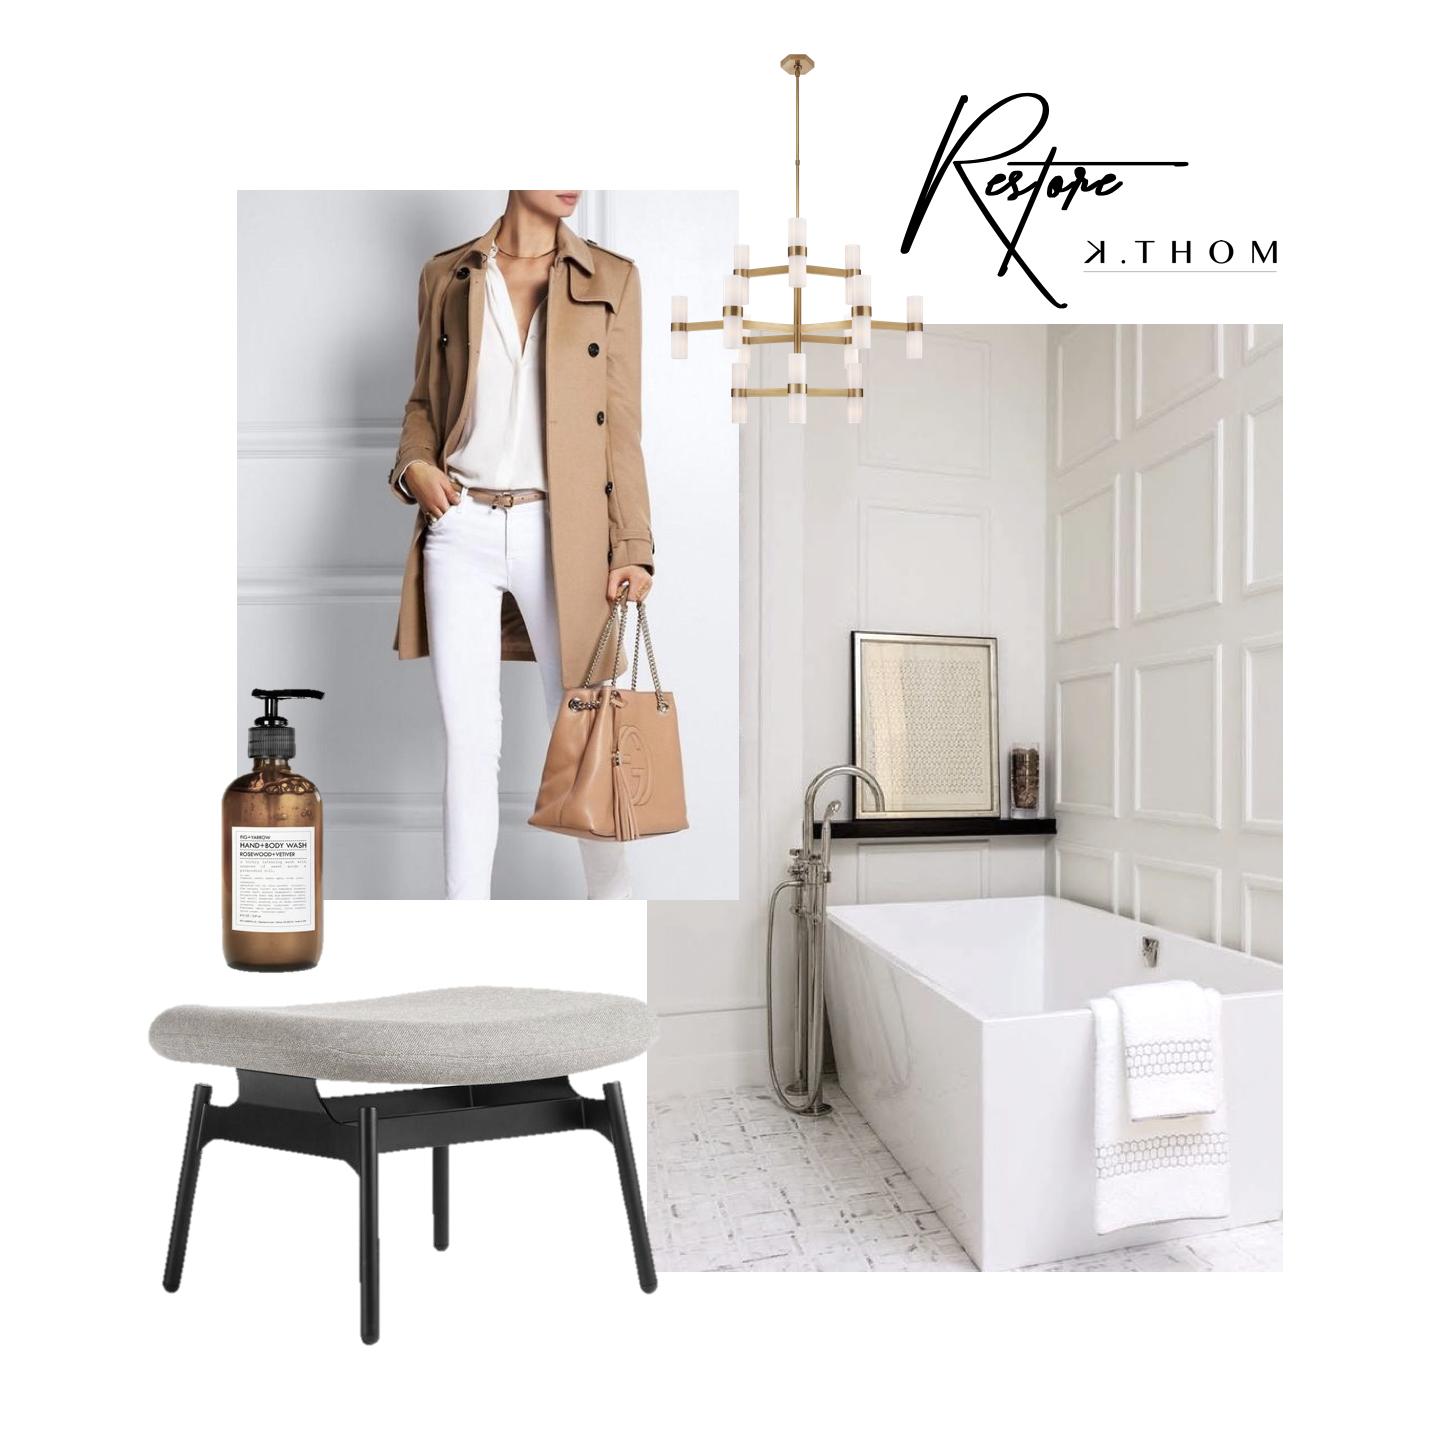 Studio Thomas Bathroom Design.png